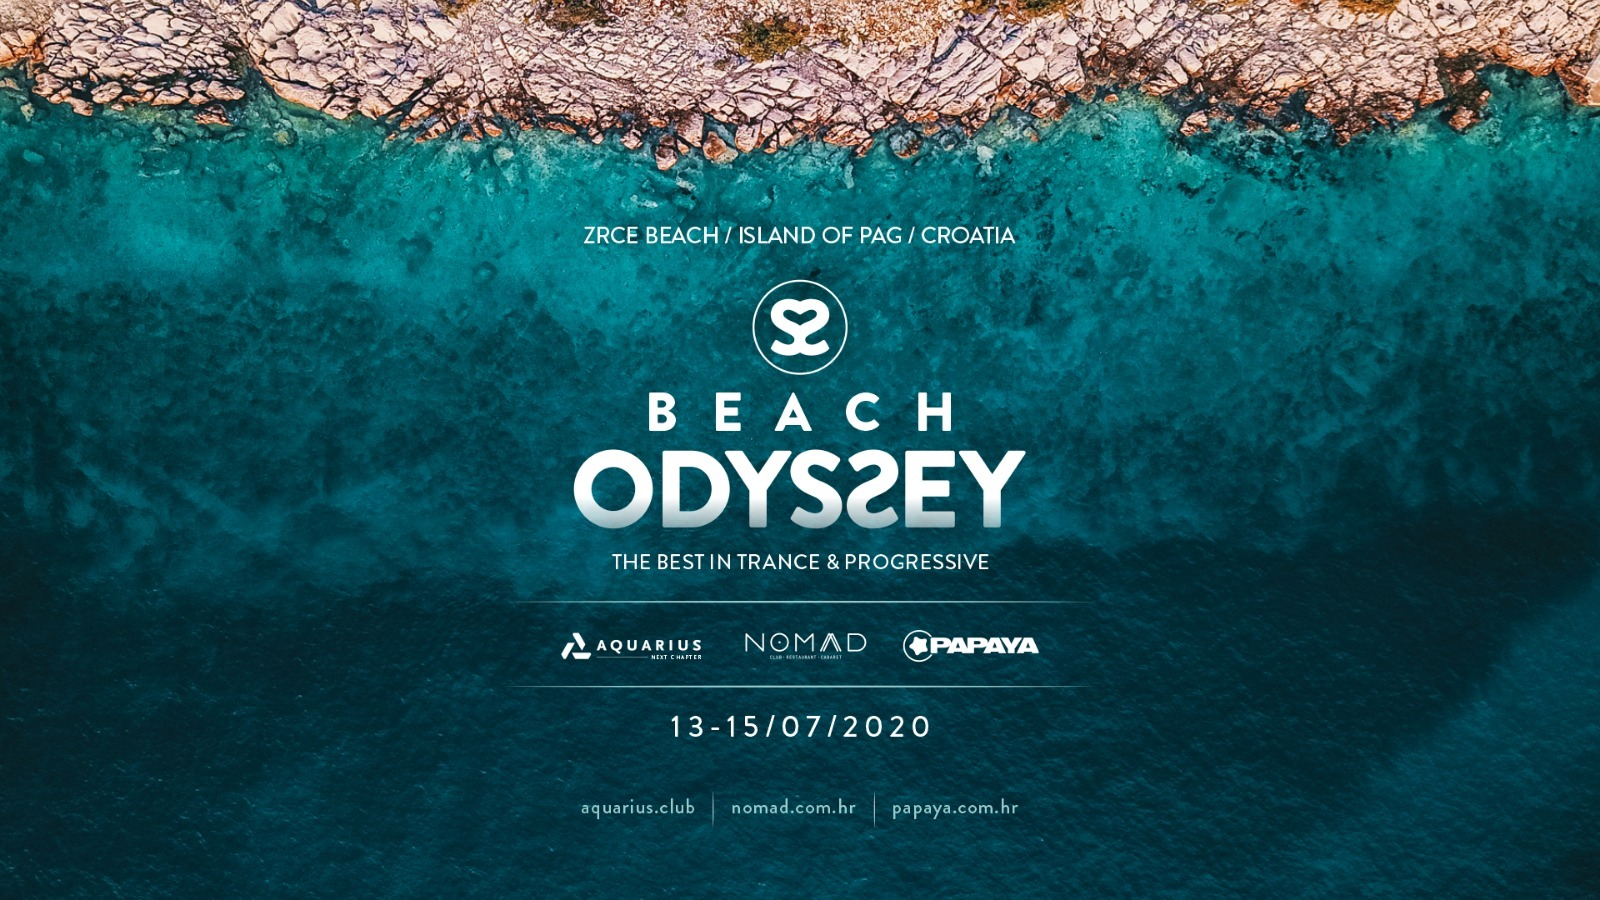 BEACH ODYSSEY FESTIVAL 2020